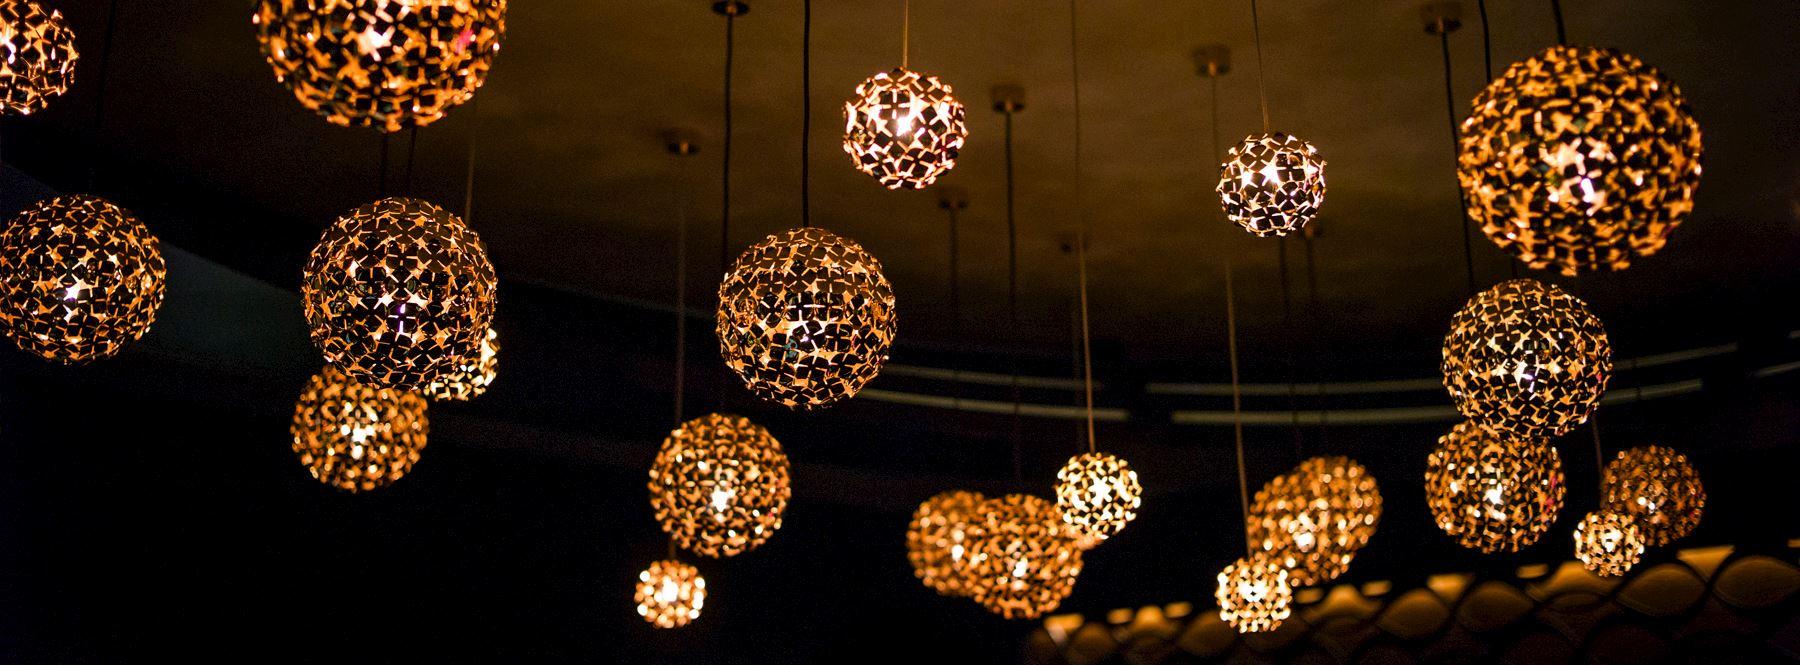 OroNero lighting design elements